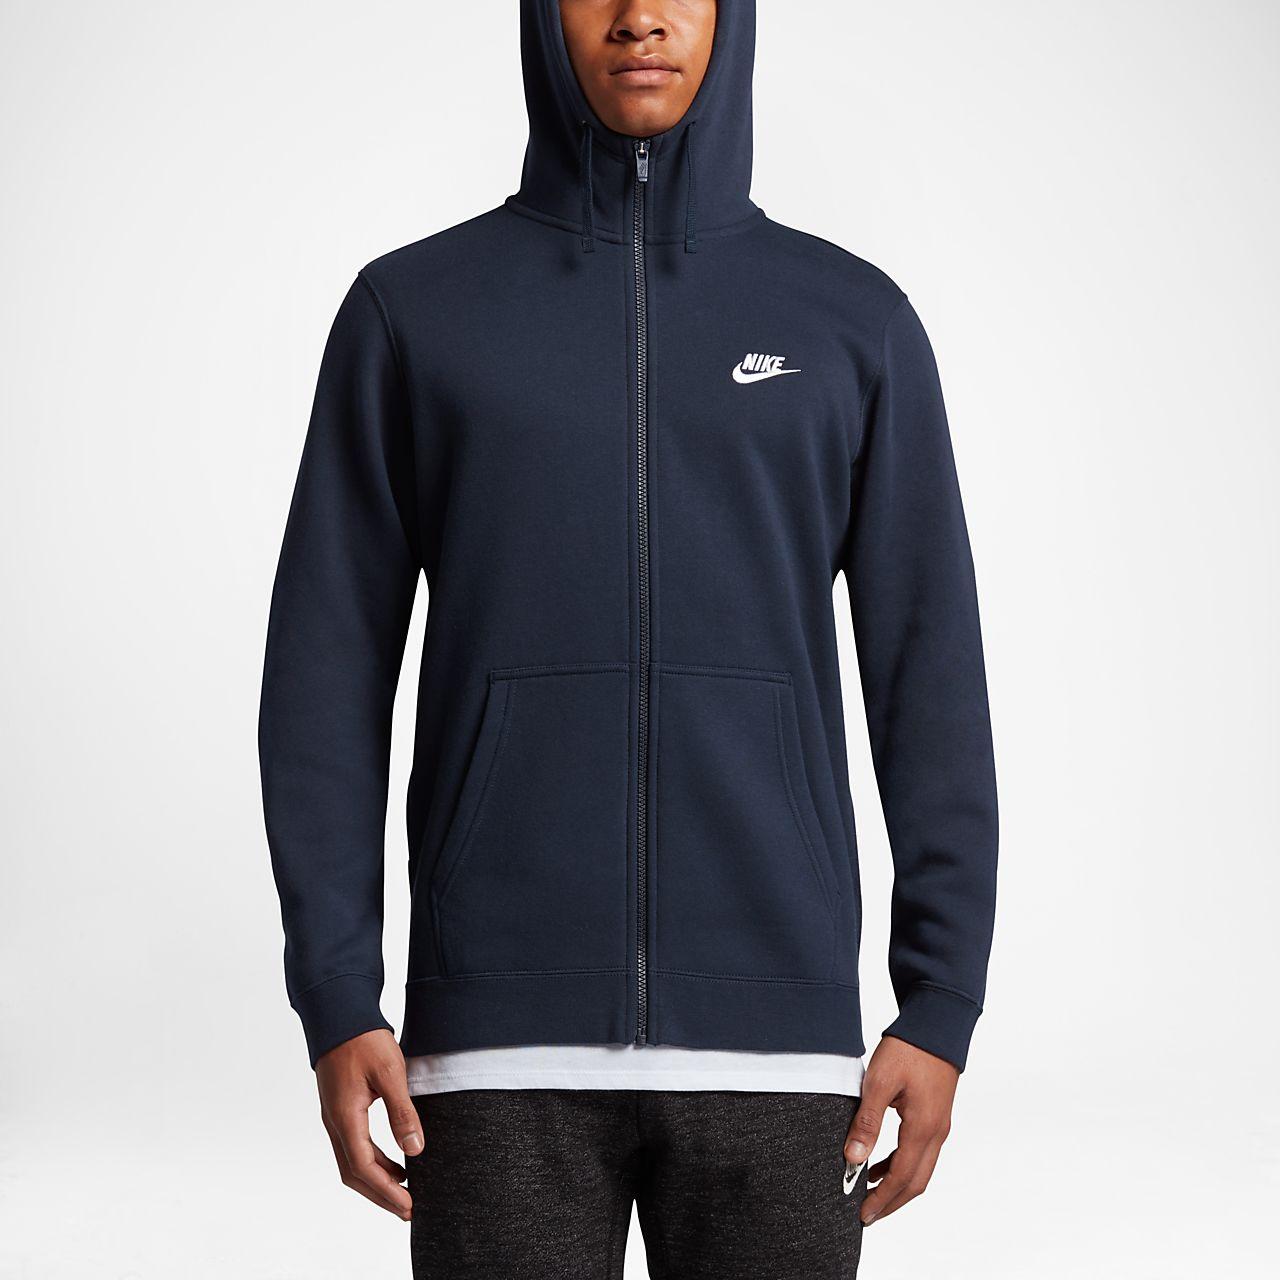 dc749d83a94b Nike Sportswear Club Fleece Men s Hoodie. Nike.com NO